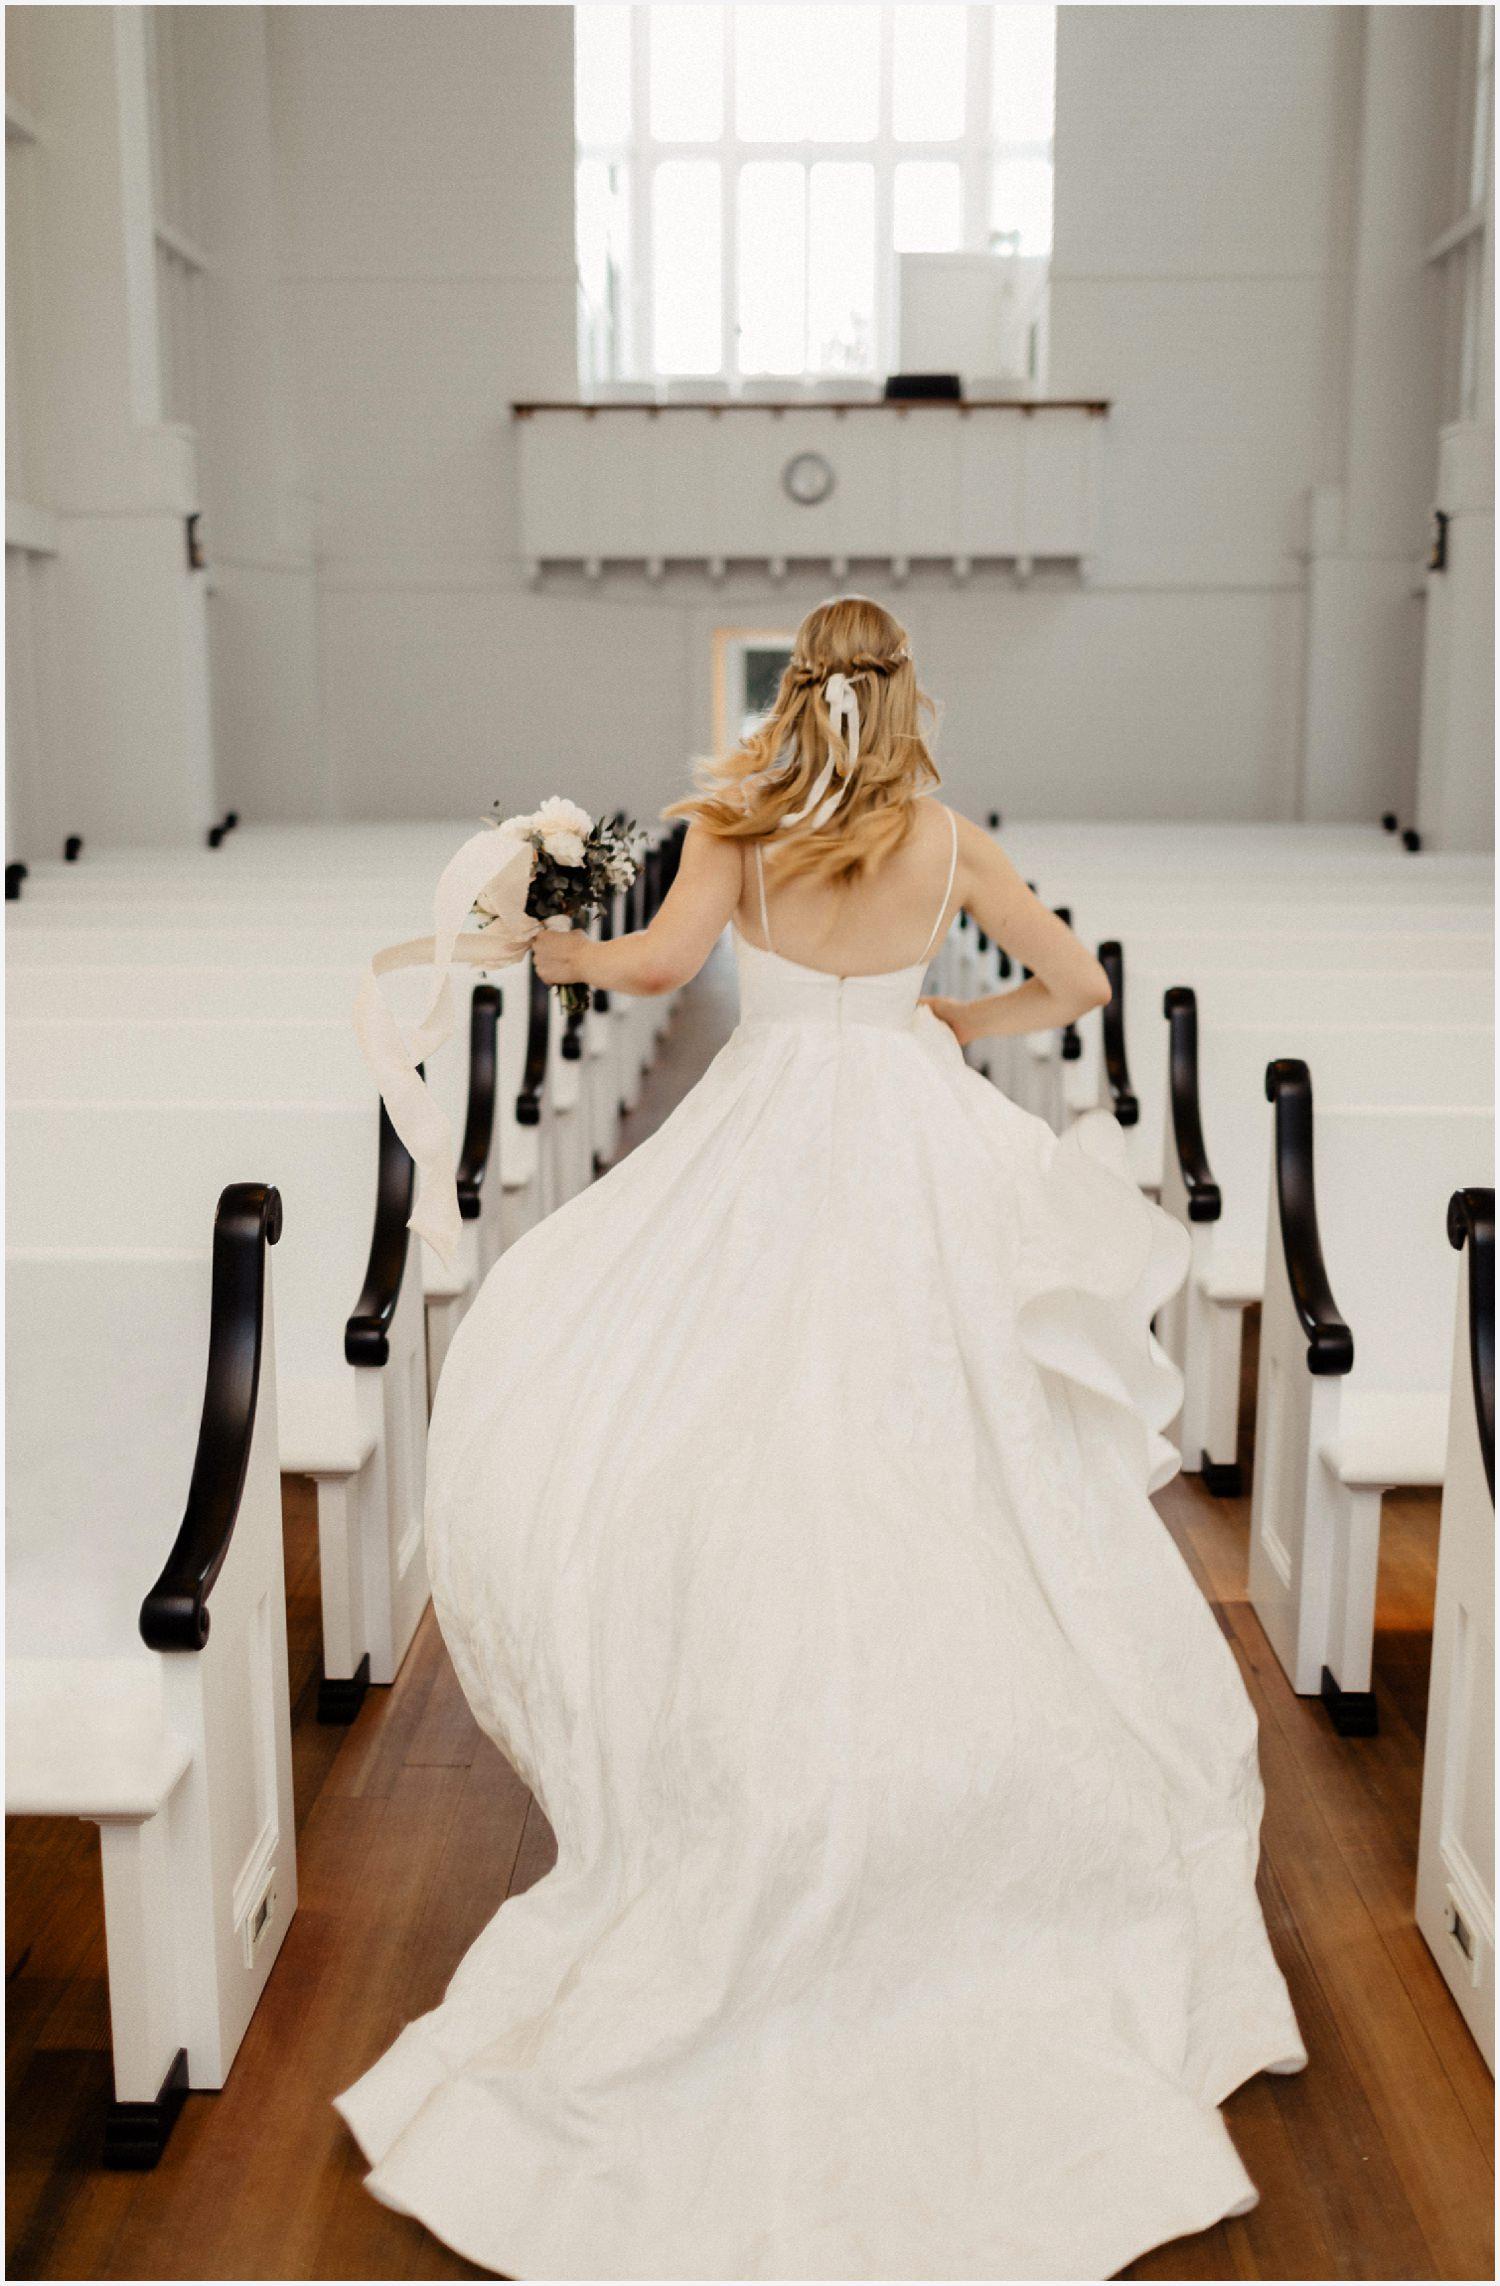 Bride running in the Seaside Chapel